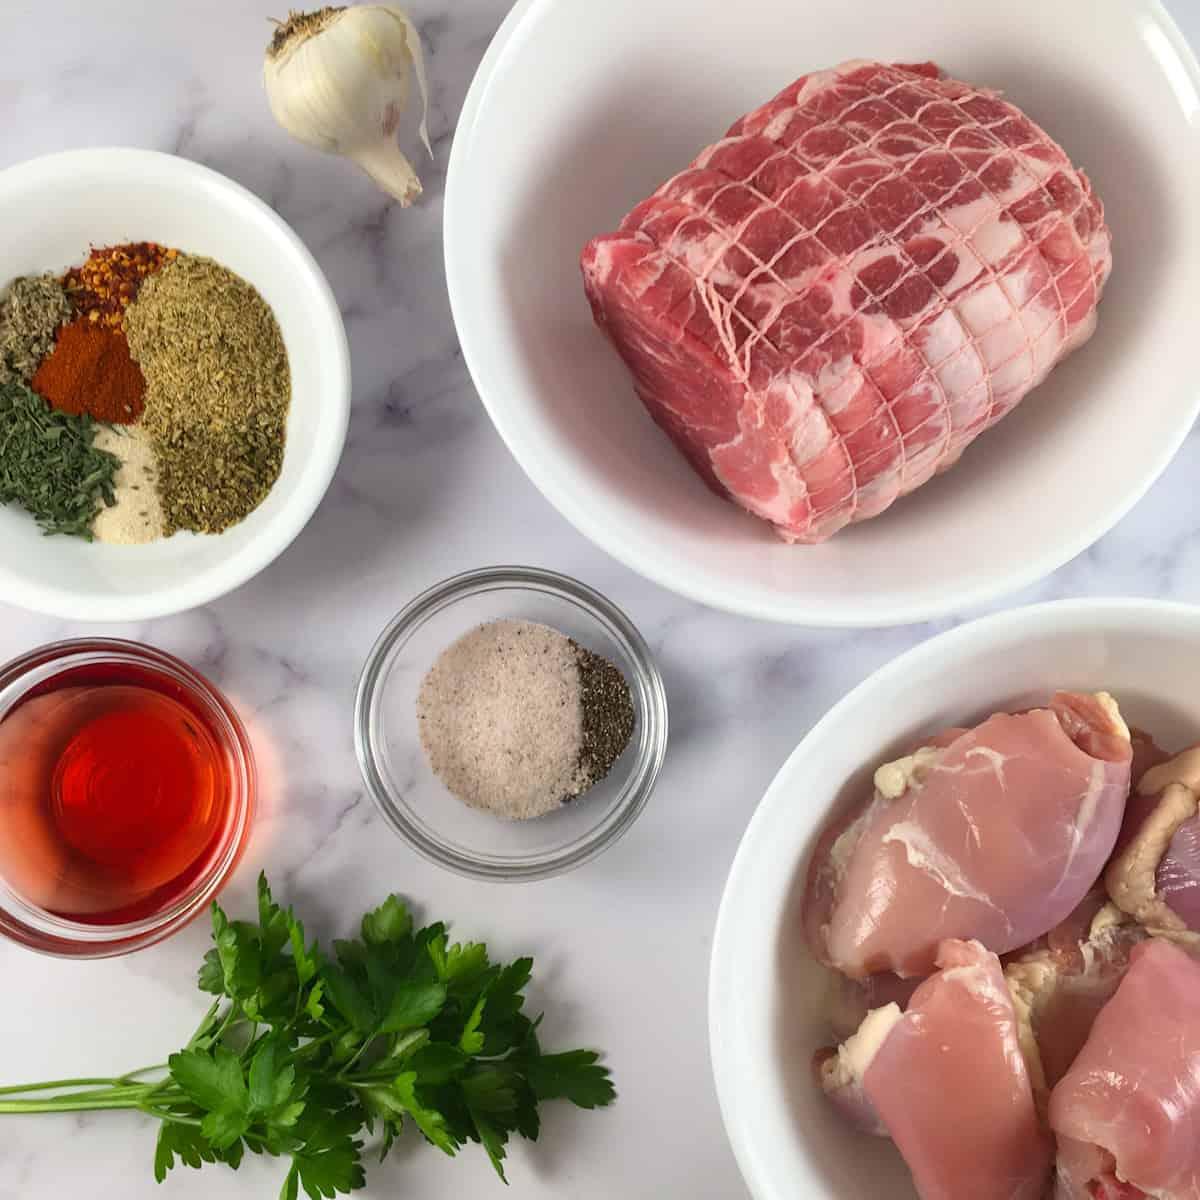 italian fennel sausage ingredients